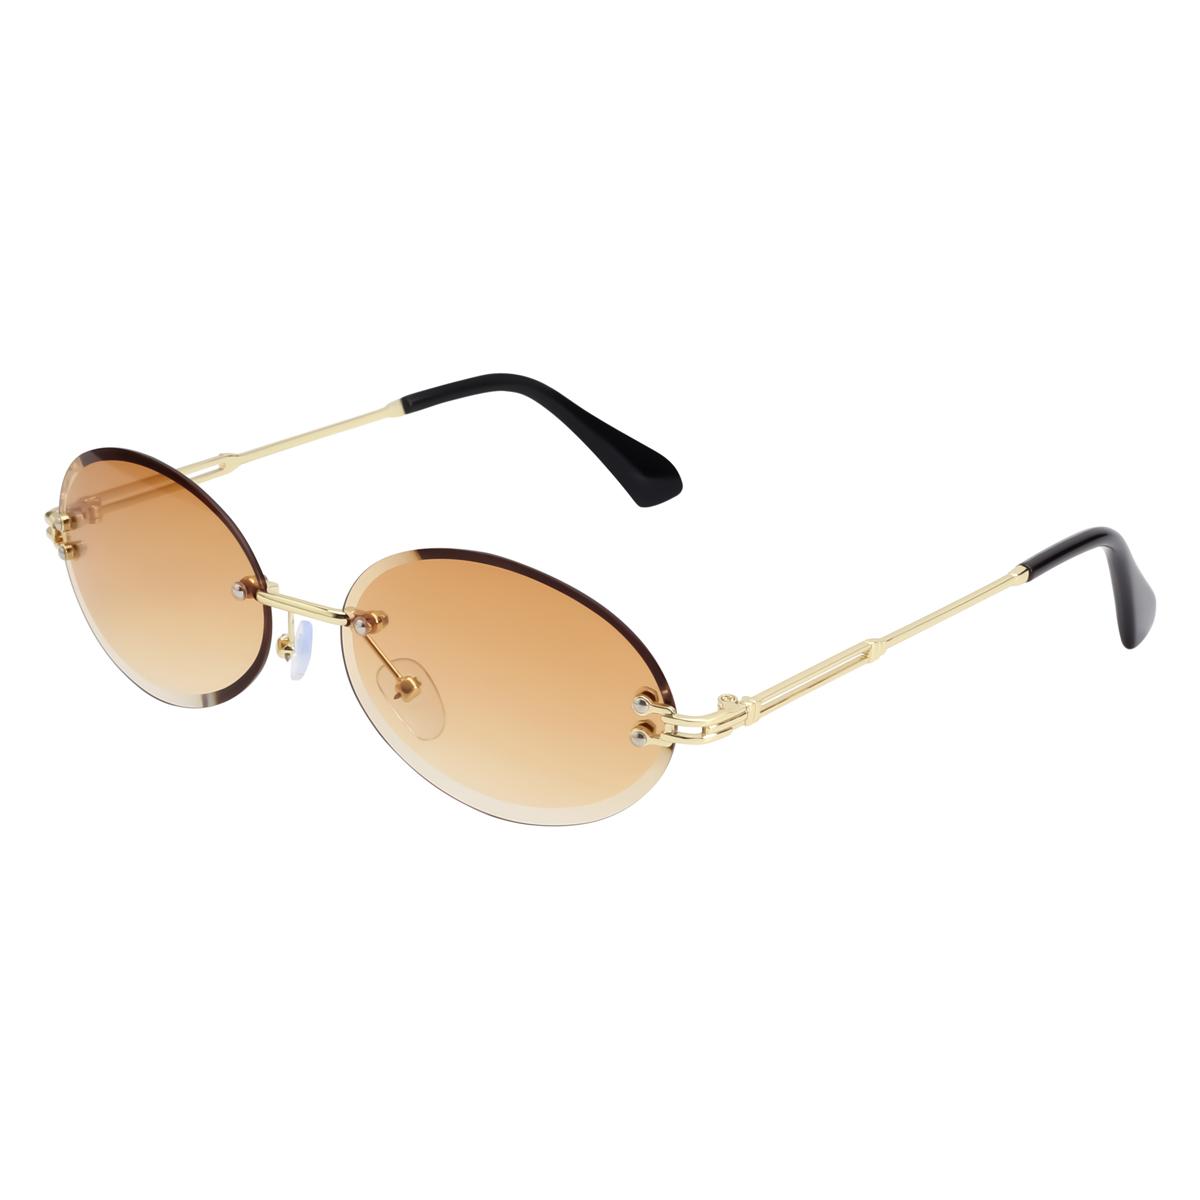 Sonnenbrille oval eye